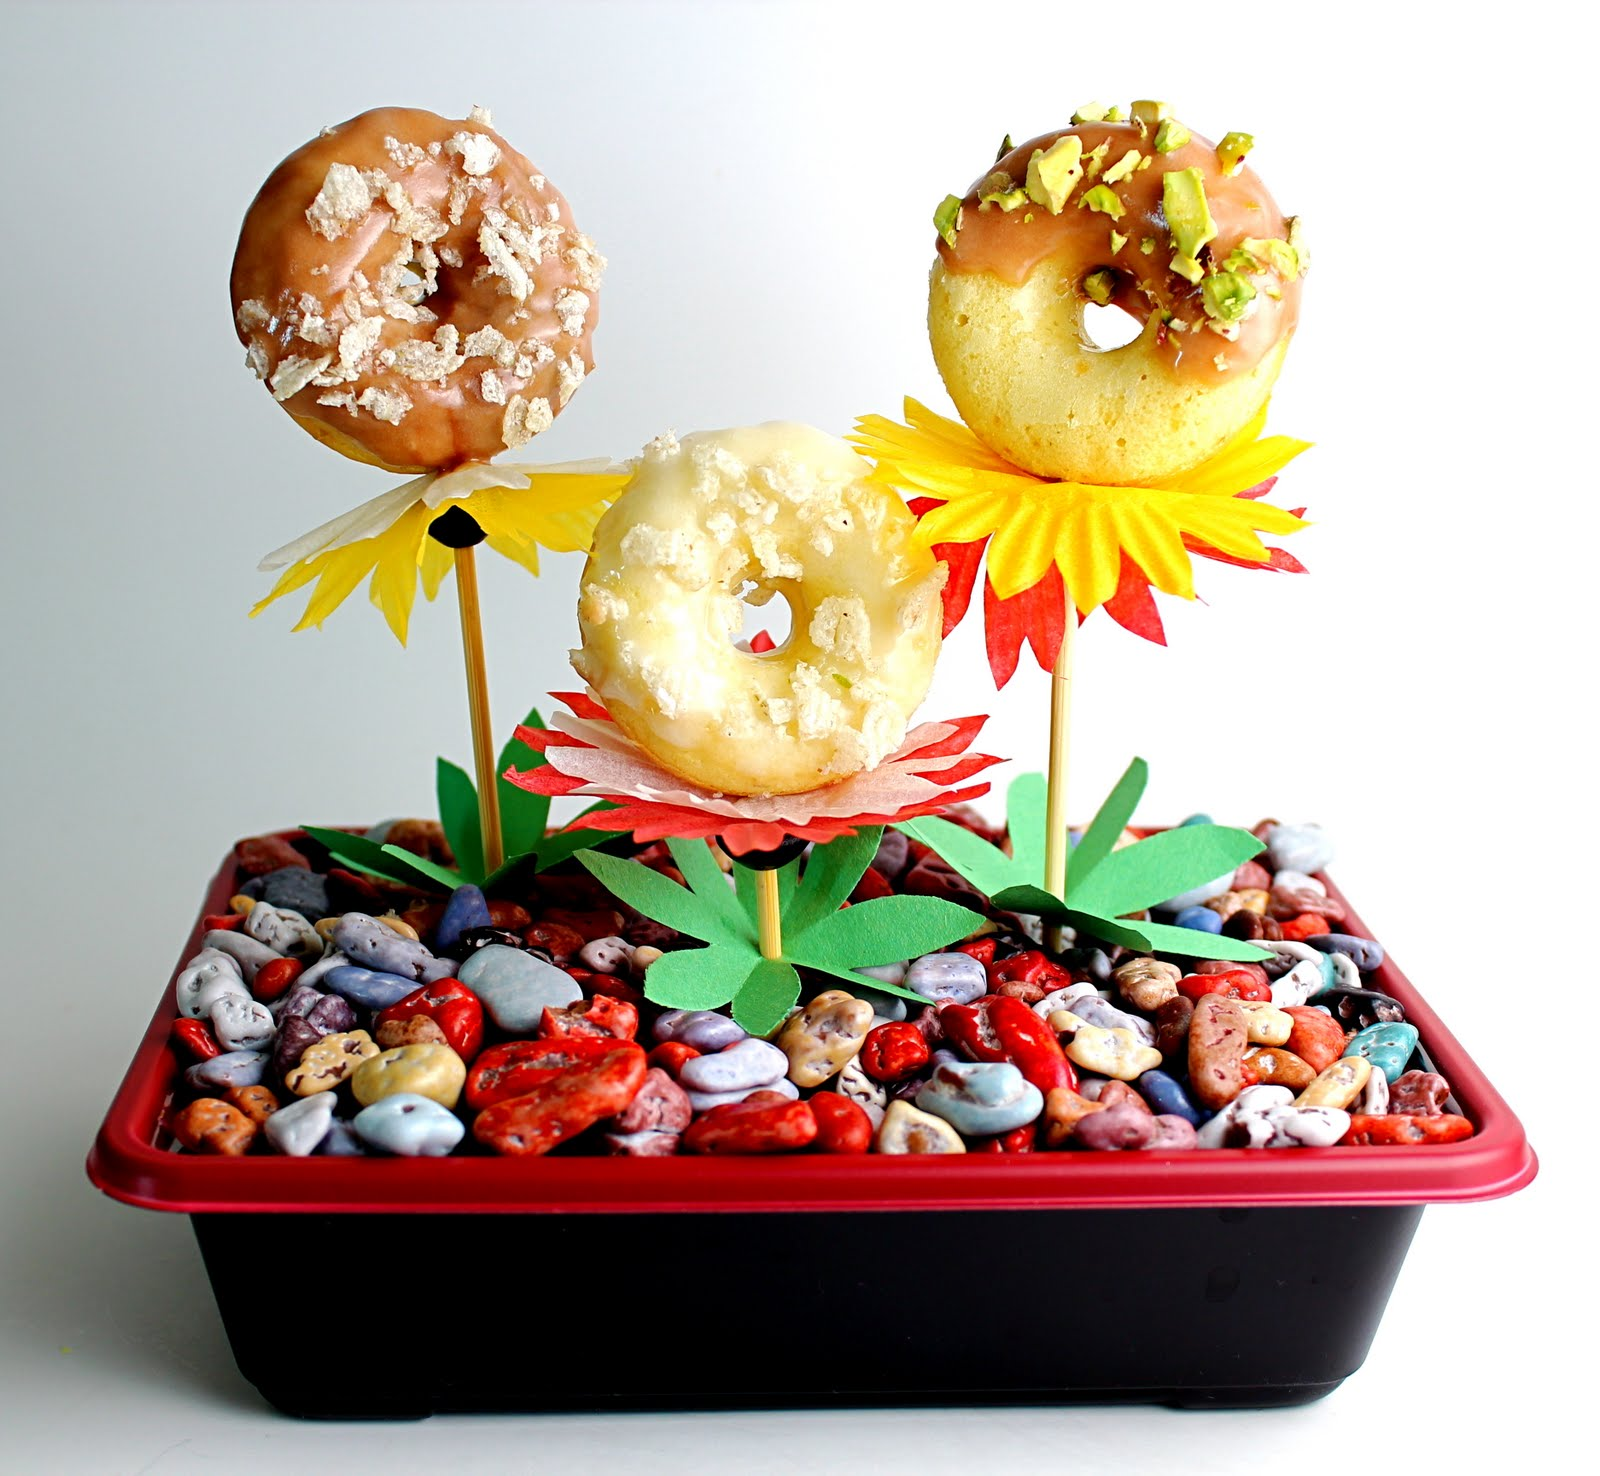 Doughnut Plant: Of Freudian Tweets And Doughnut Plants